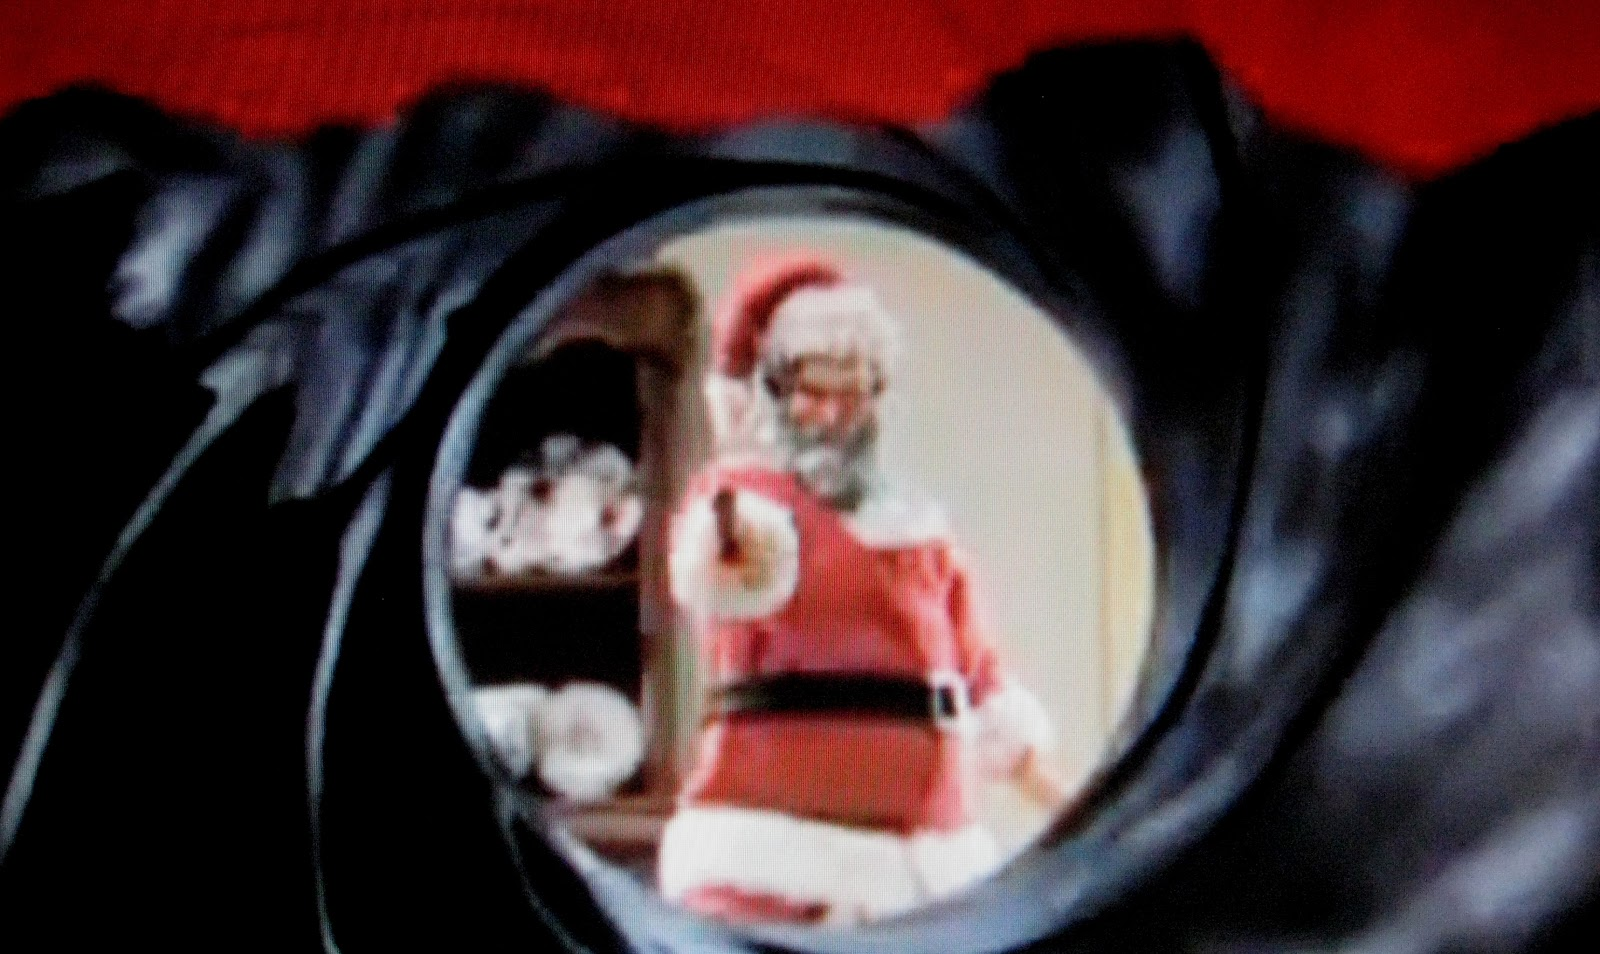 http://2.bp.blogspot.com/-RSHC7K32jjU/UJhQIK5vJ5I/AAAAAAAAHak/Vj3YXhyPUuY/s1600/Santa.jpg